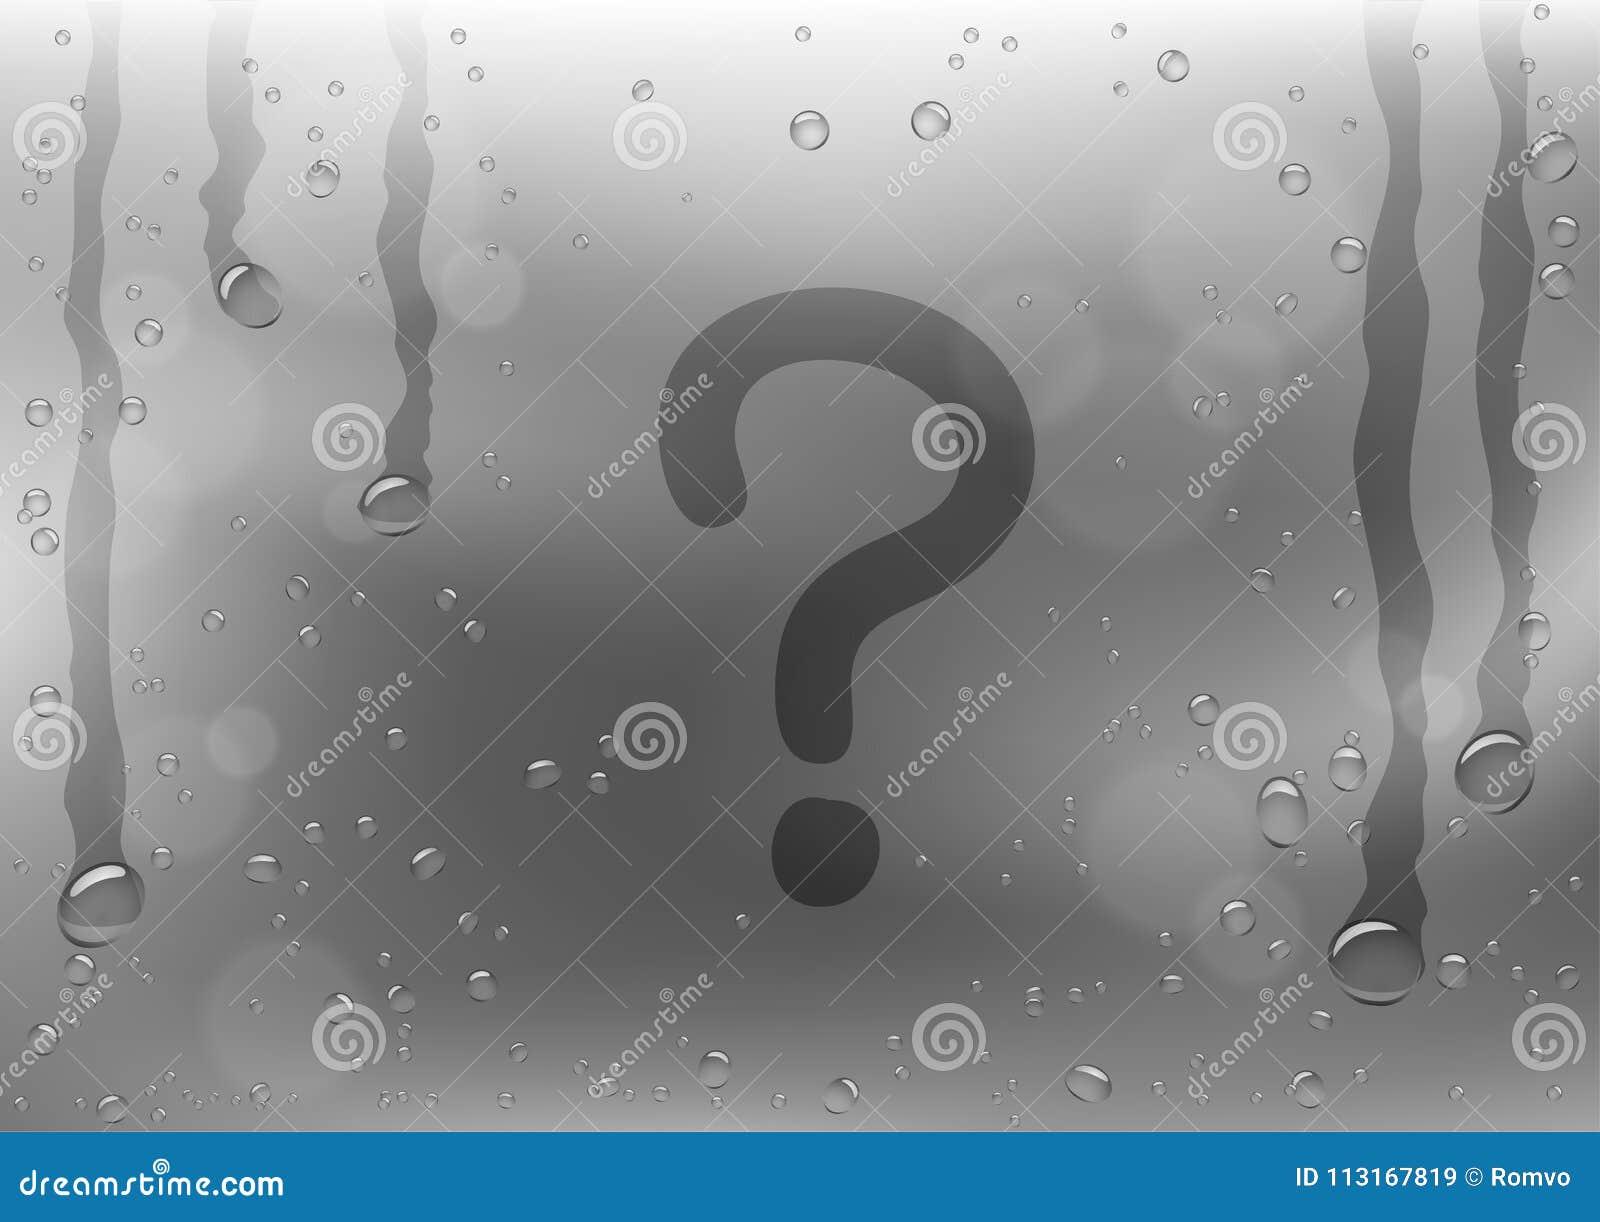 Question Mark Sign Draw On Rainy Window Stock Vector - Illustration ...